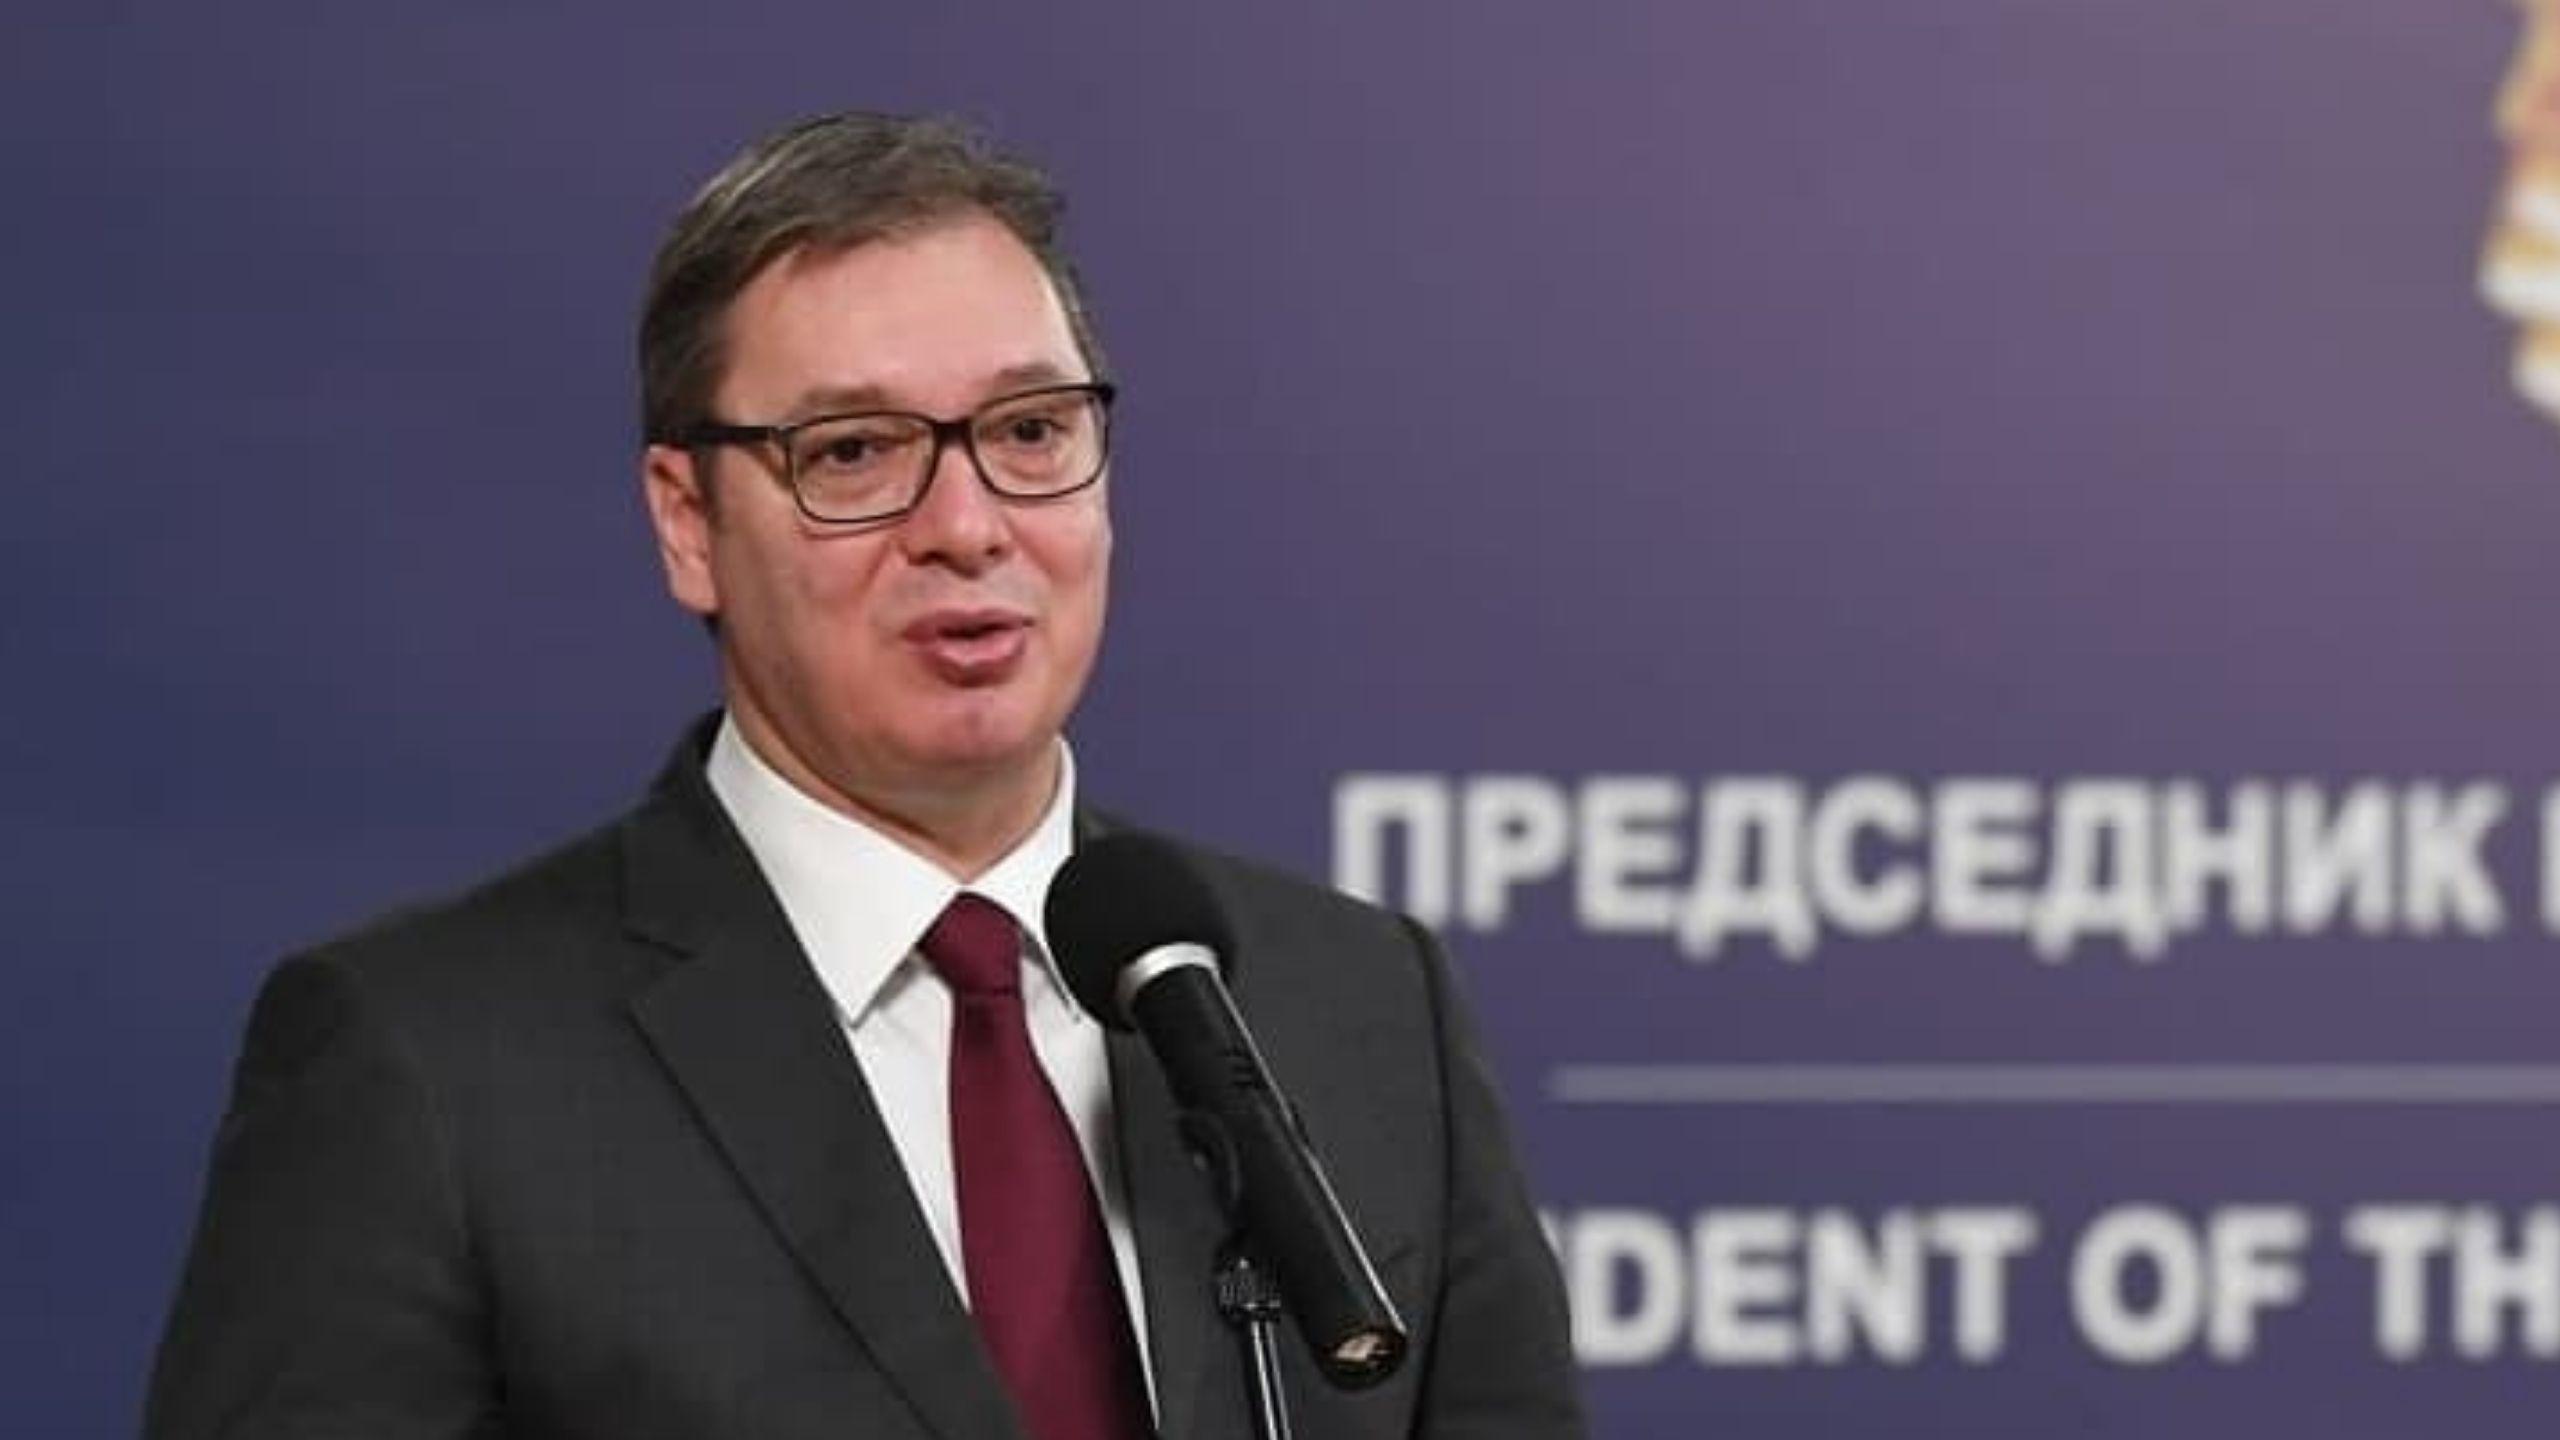 Večernje novosti: Vučić za Badnji dan i Božić na Hilandaru 1